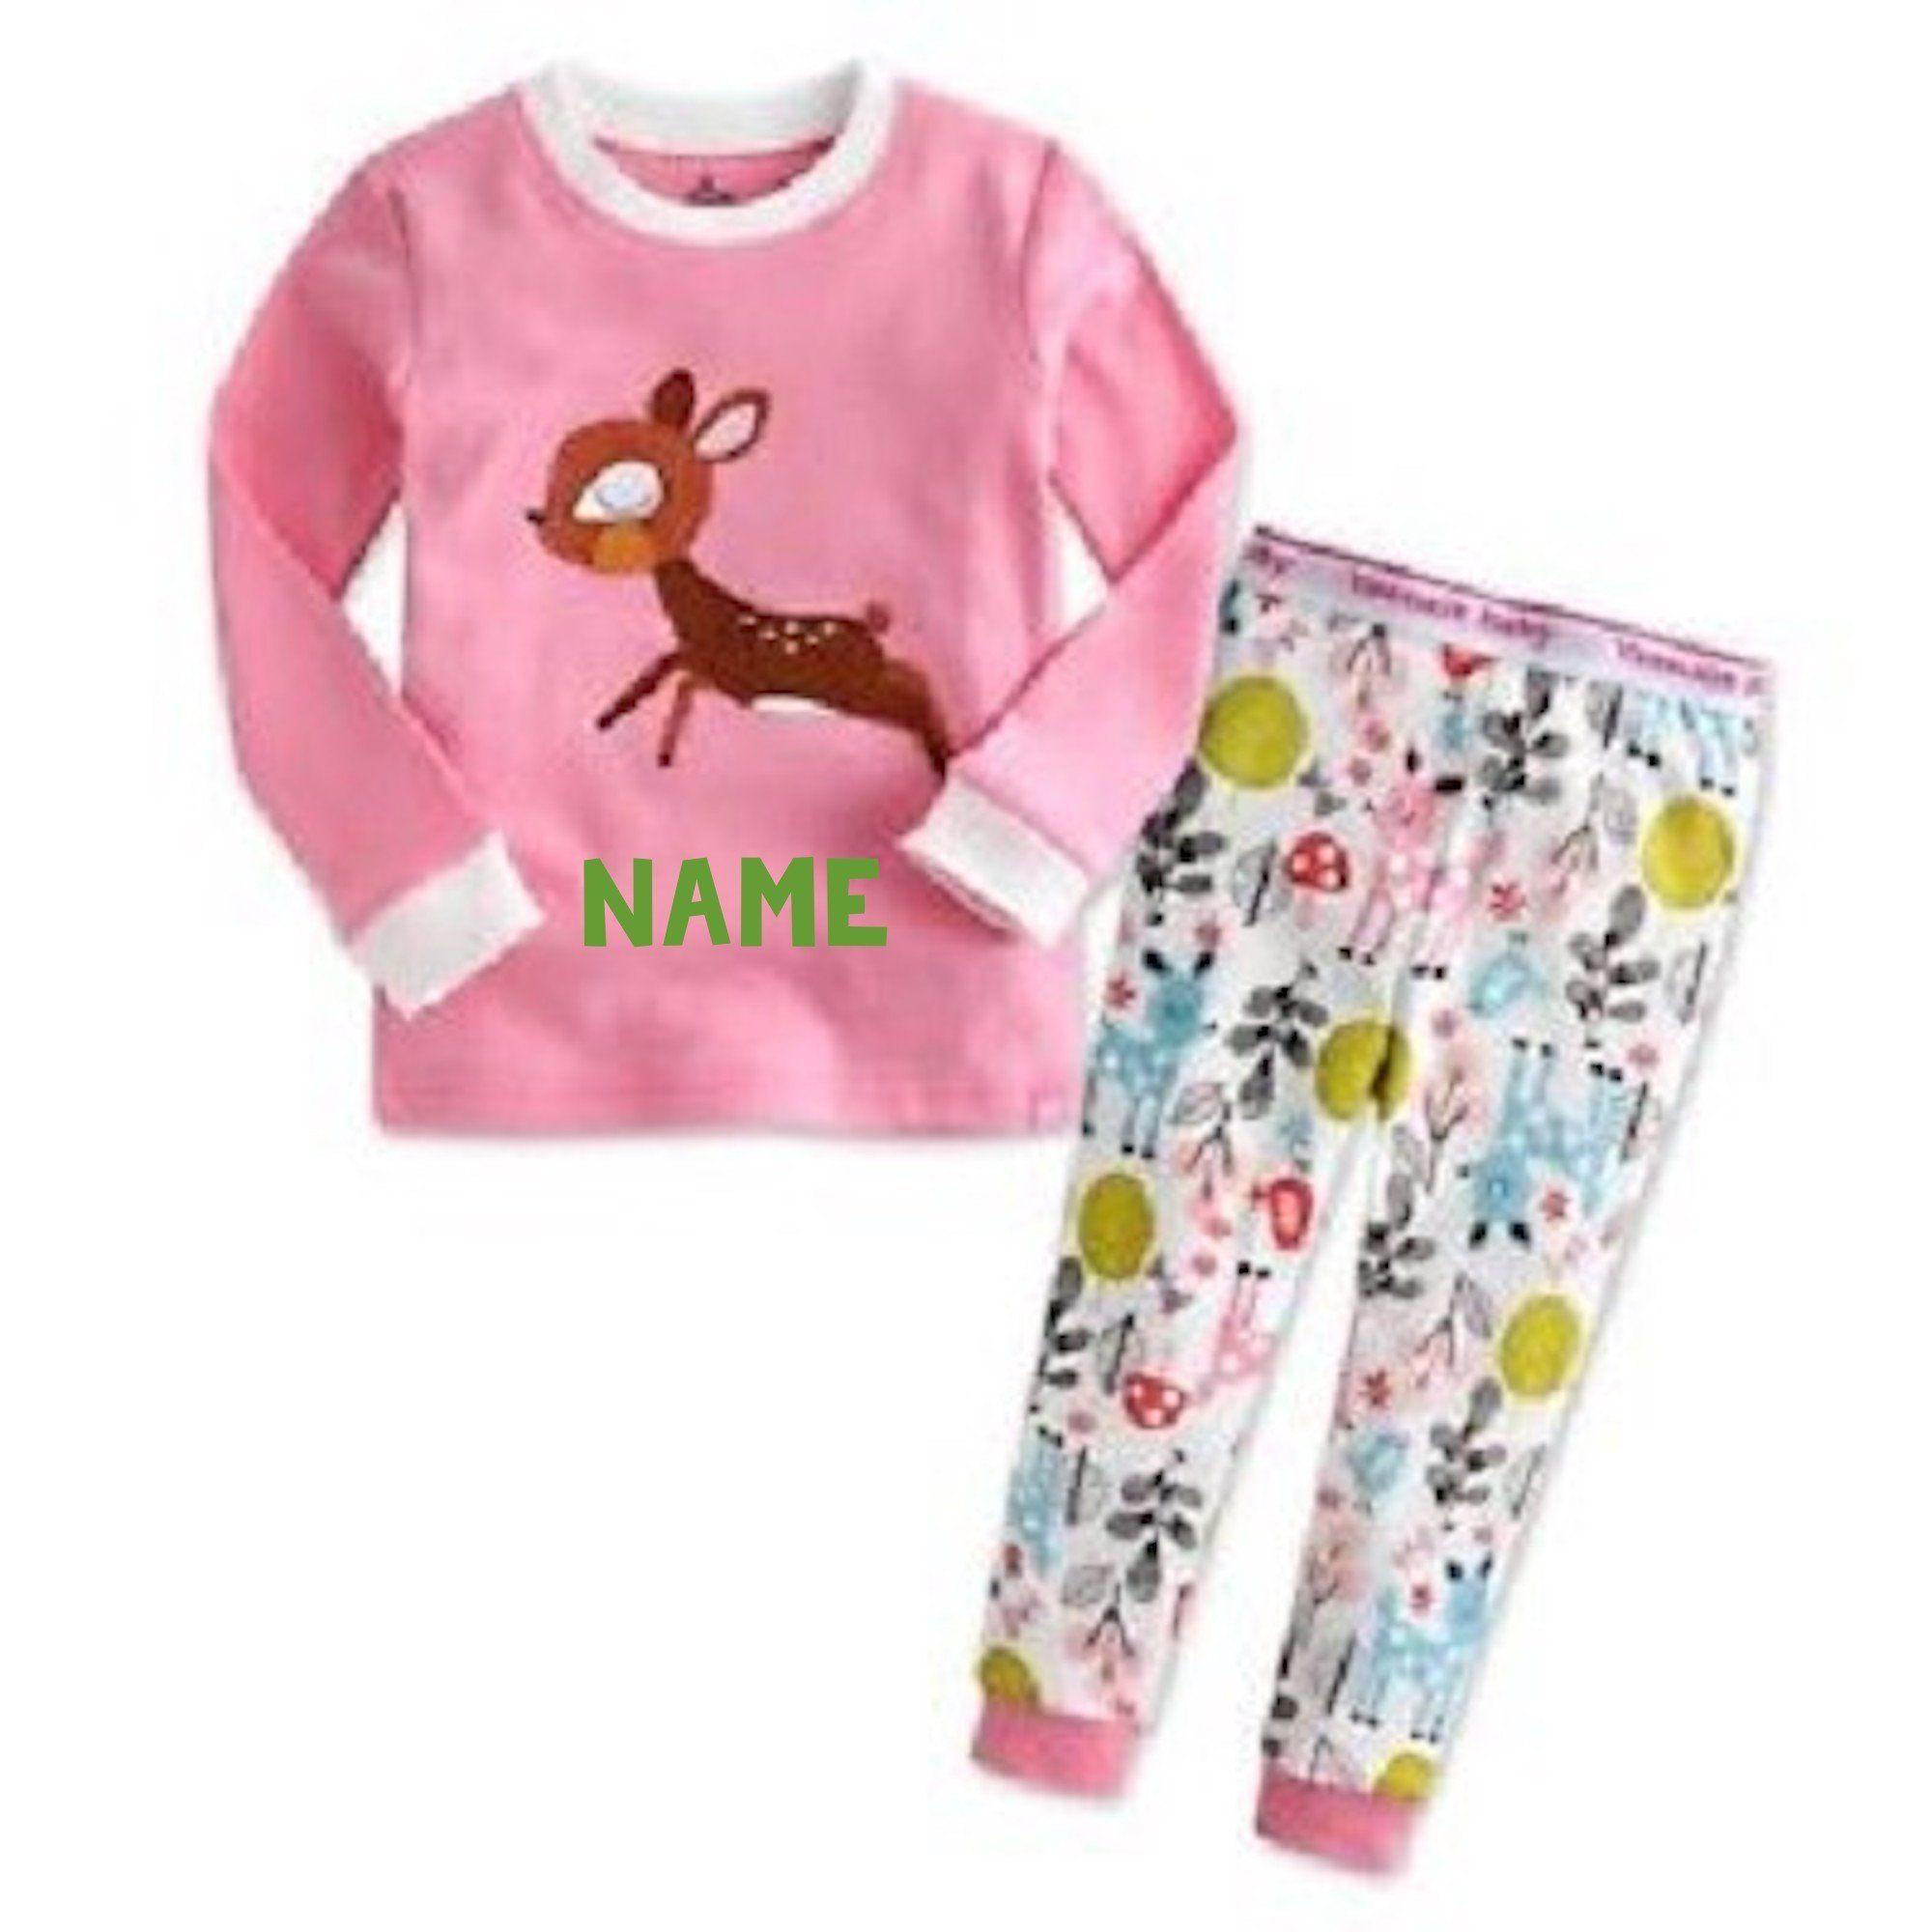 New Childrens Kids Soft Matching Pyjamas Sleepwear Pink Nightwear PJs Sets